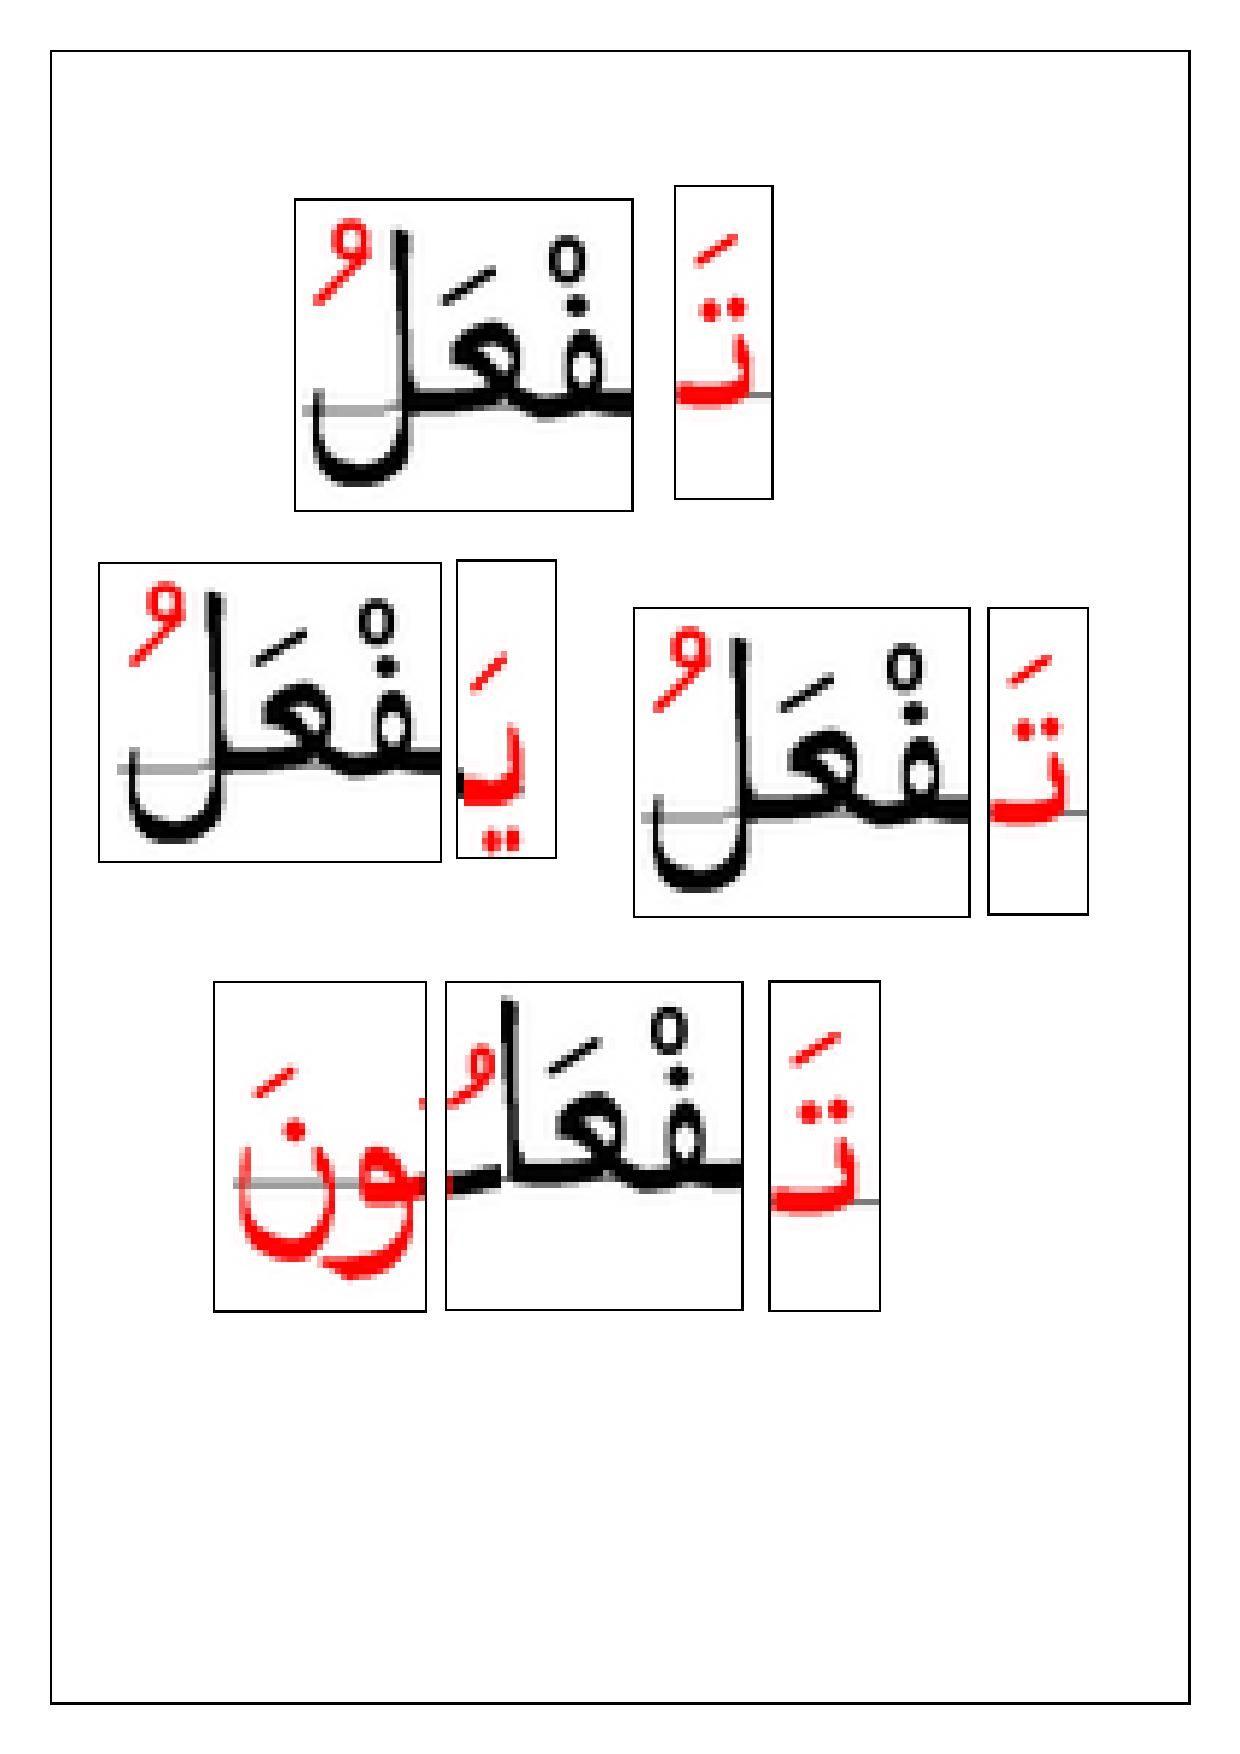 Arabic Present Tense Jigsaw Set Free At Abicadventures